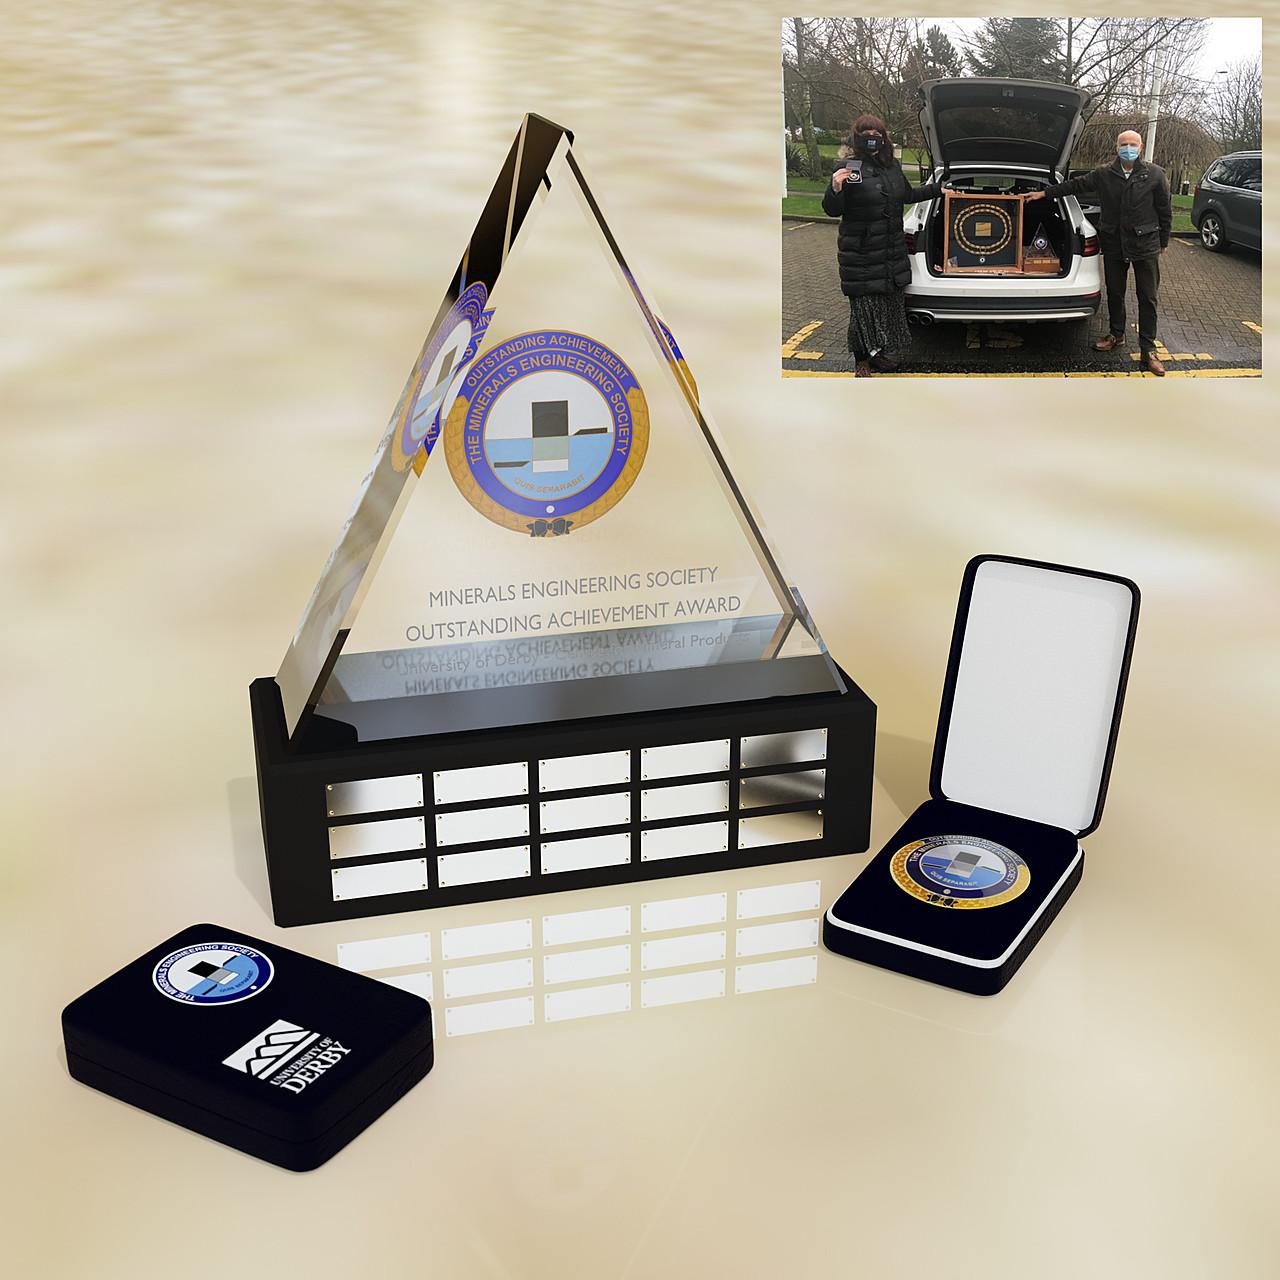 Minerals Engineering Society Legacy Award